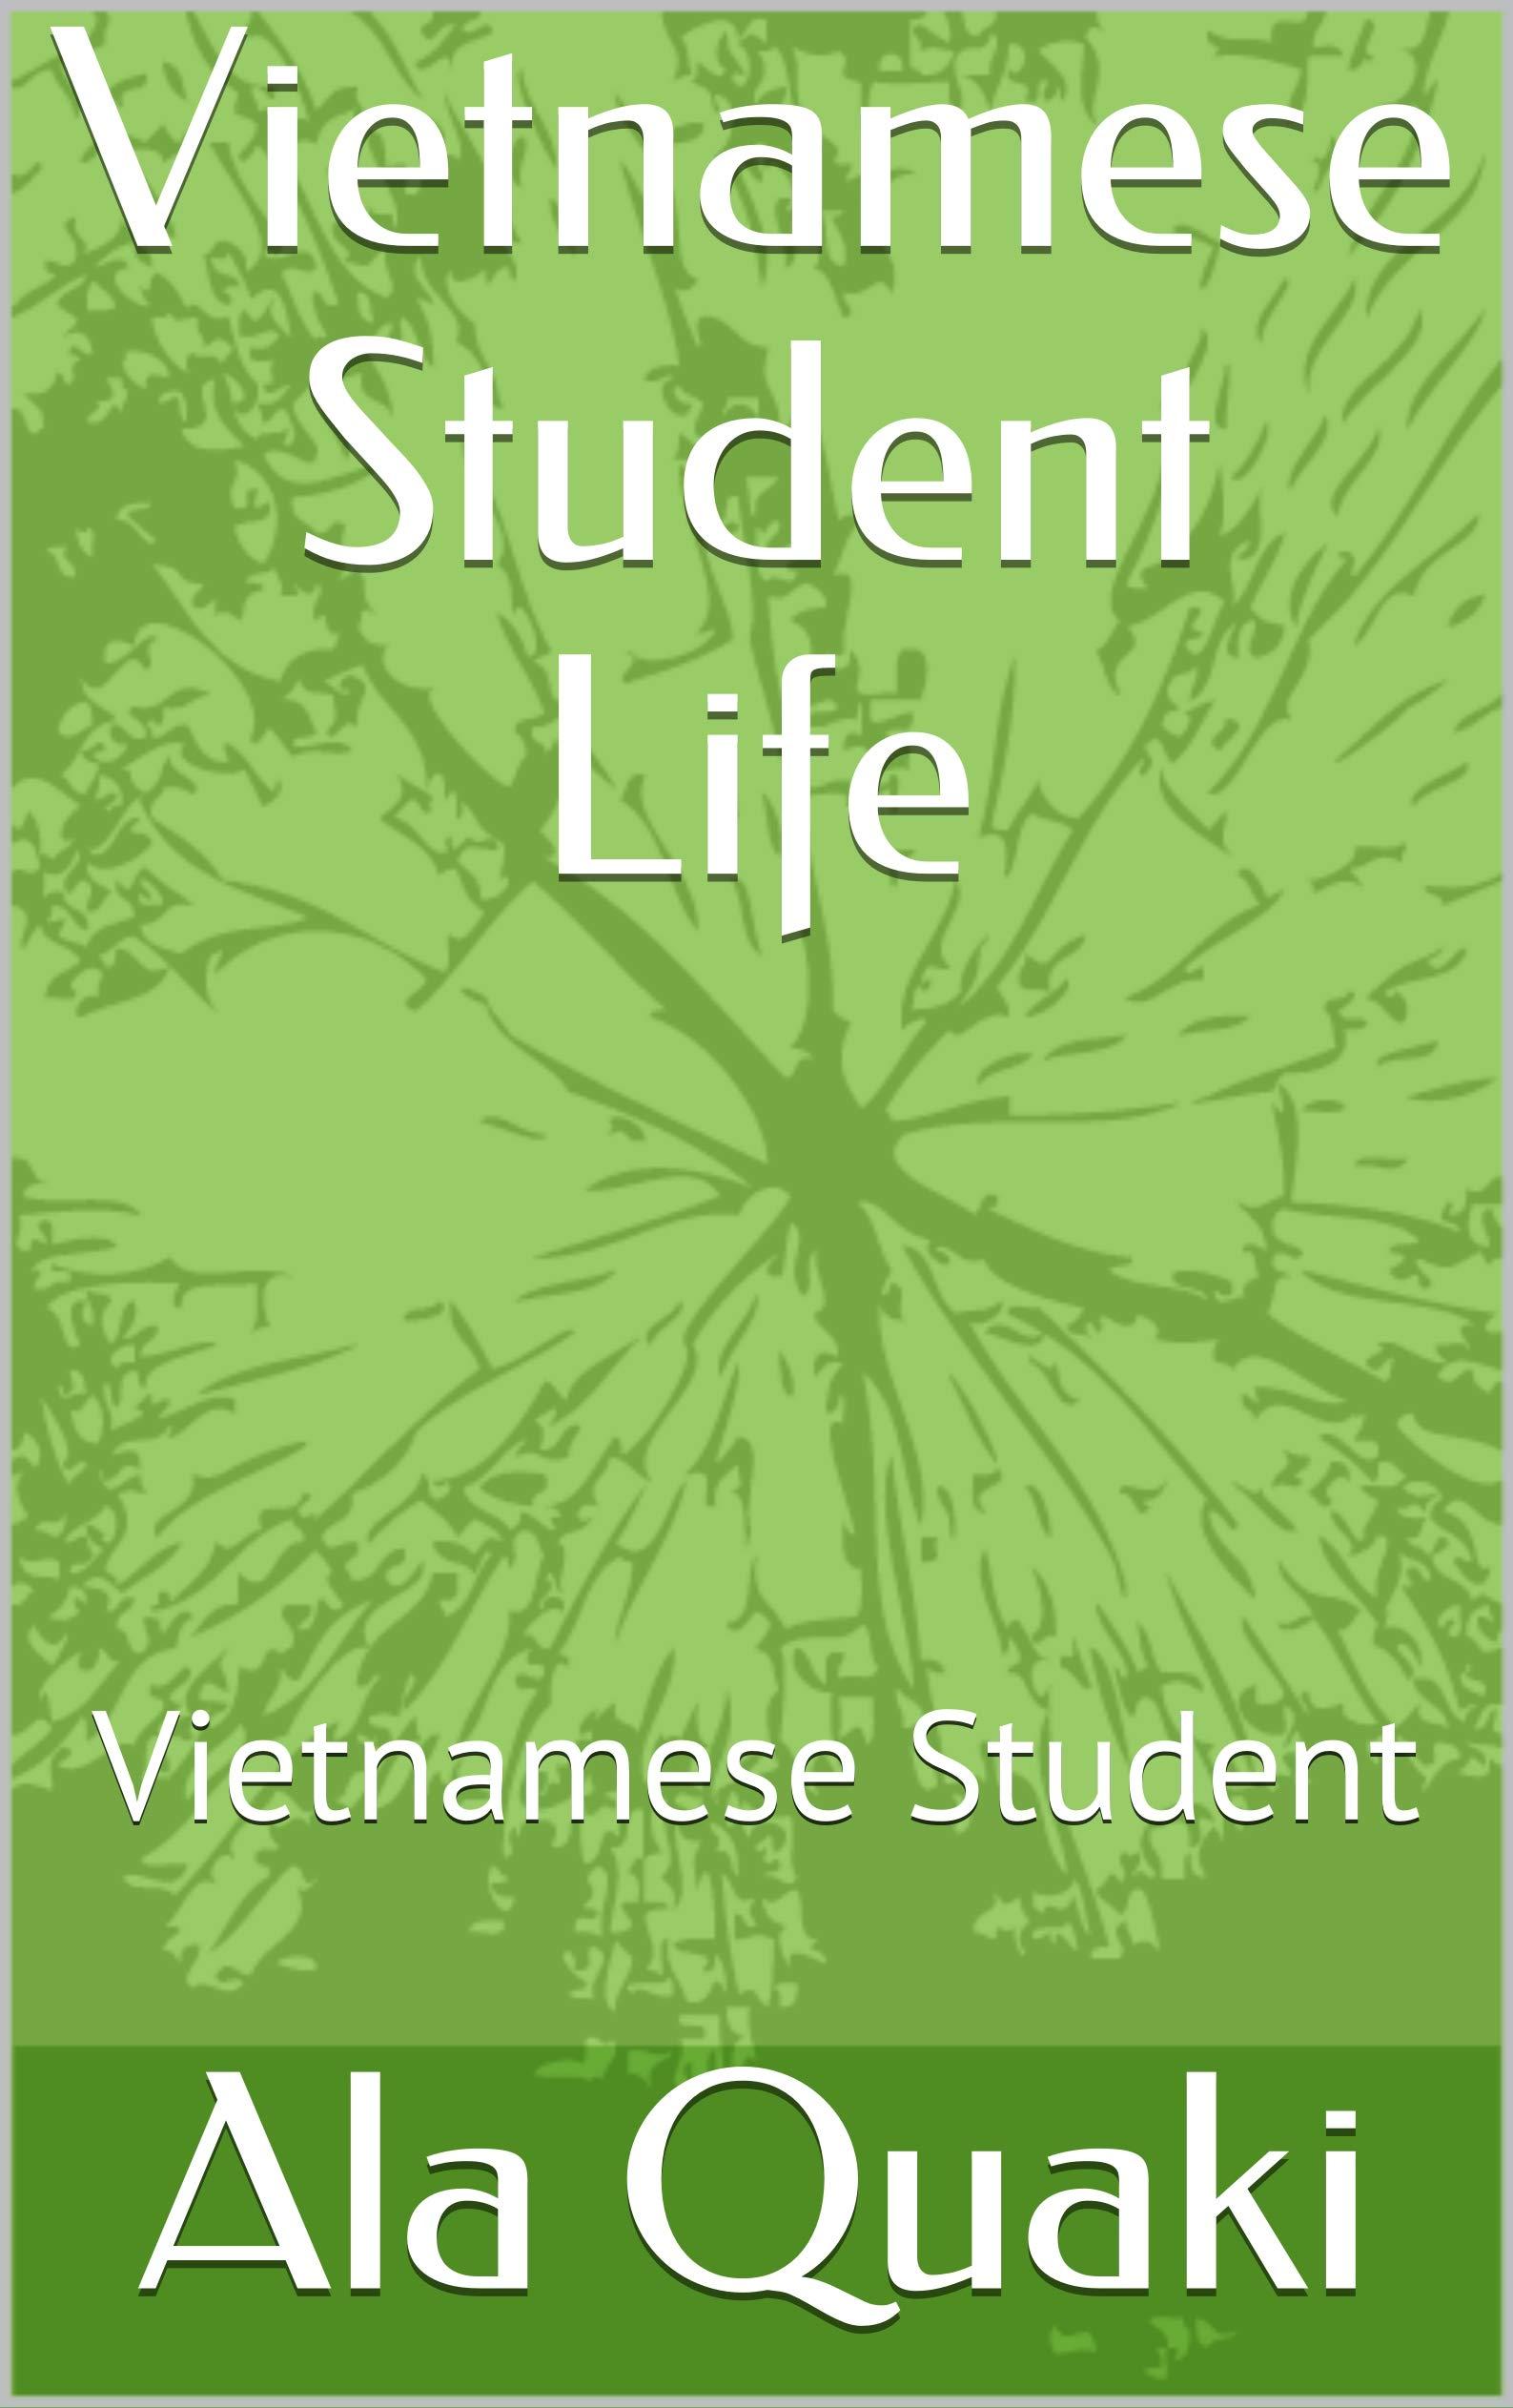 Vietnamese Student Life: Vietnamese Student